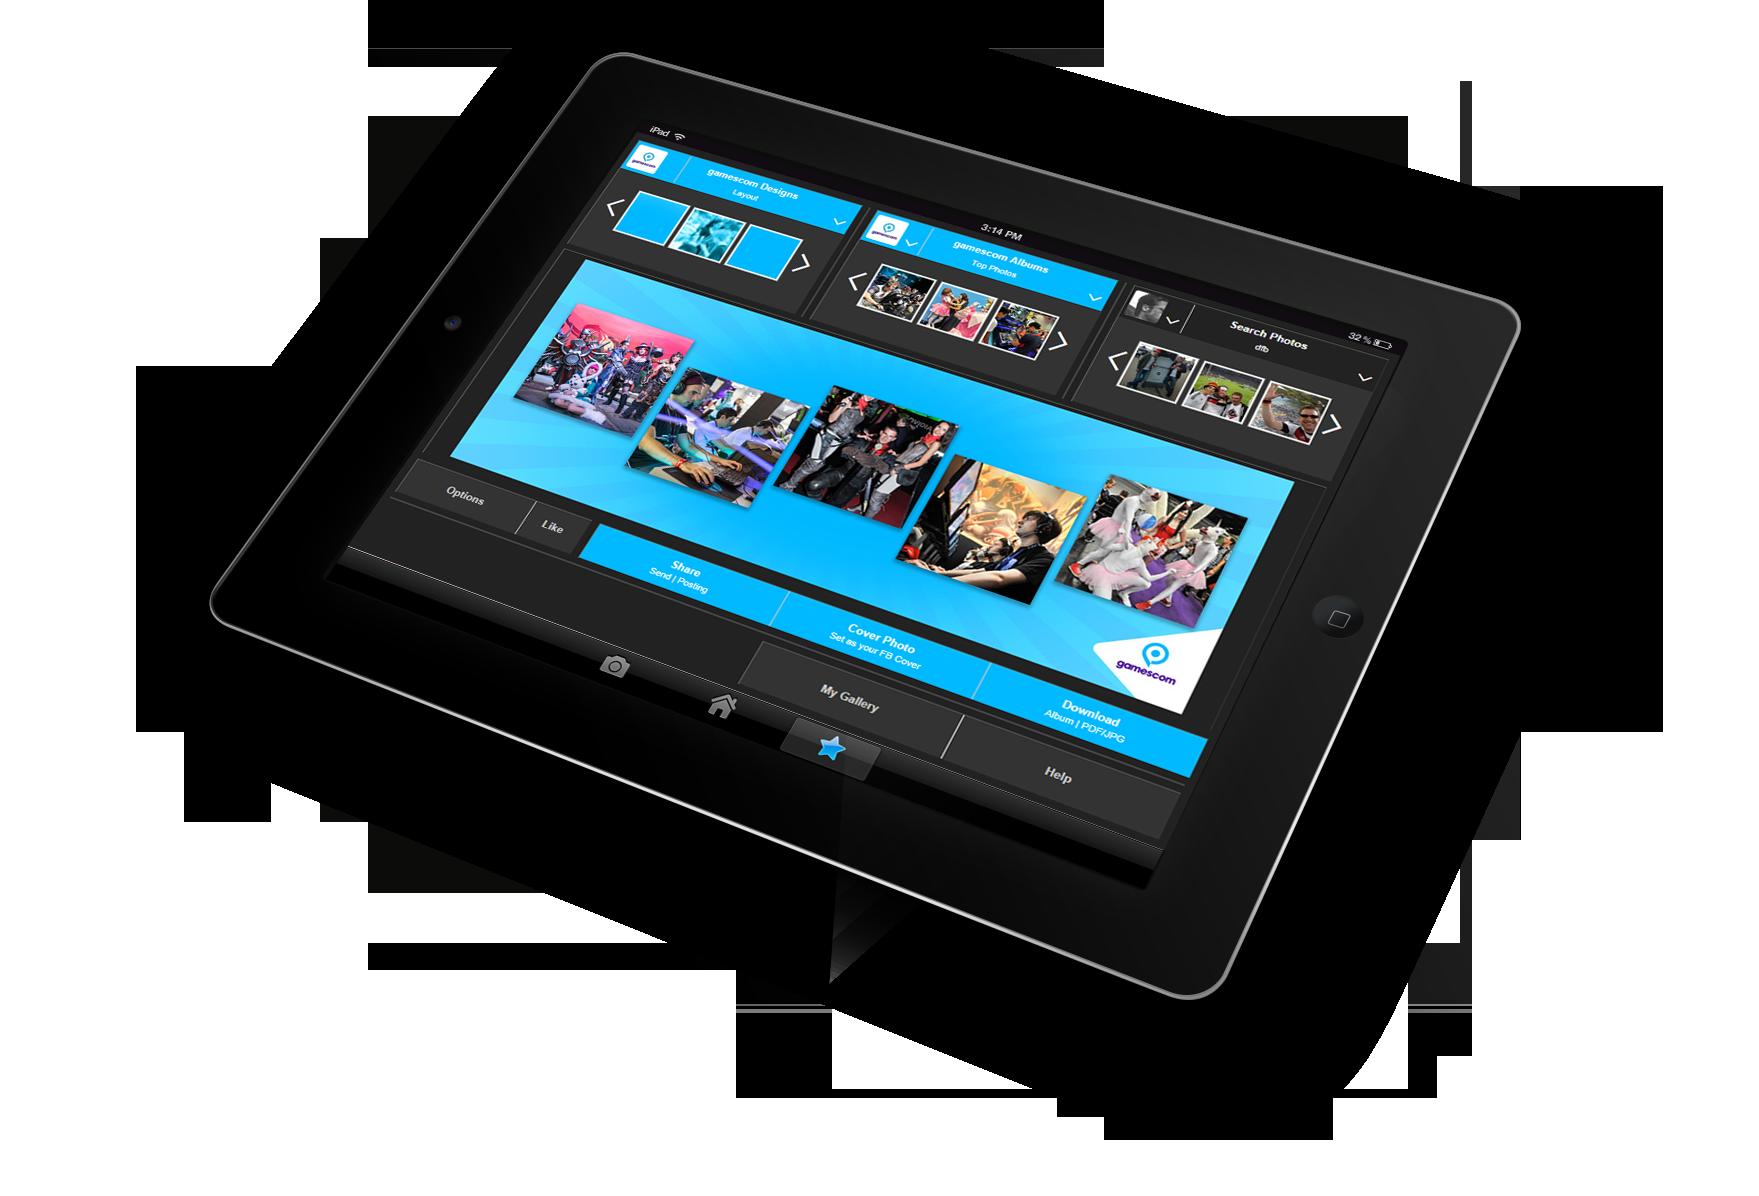 iPad2-Black-Perspective-View-Landscape-Mockup2